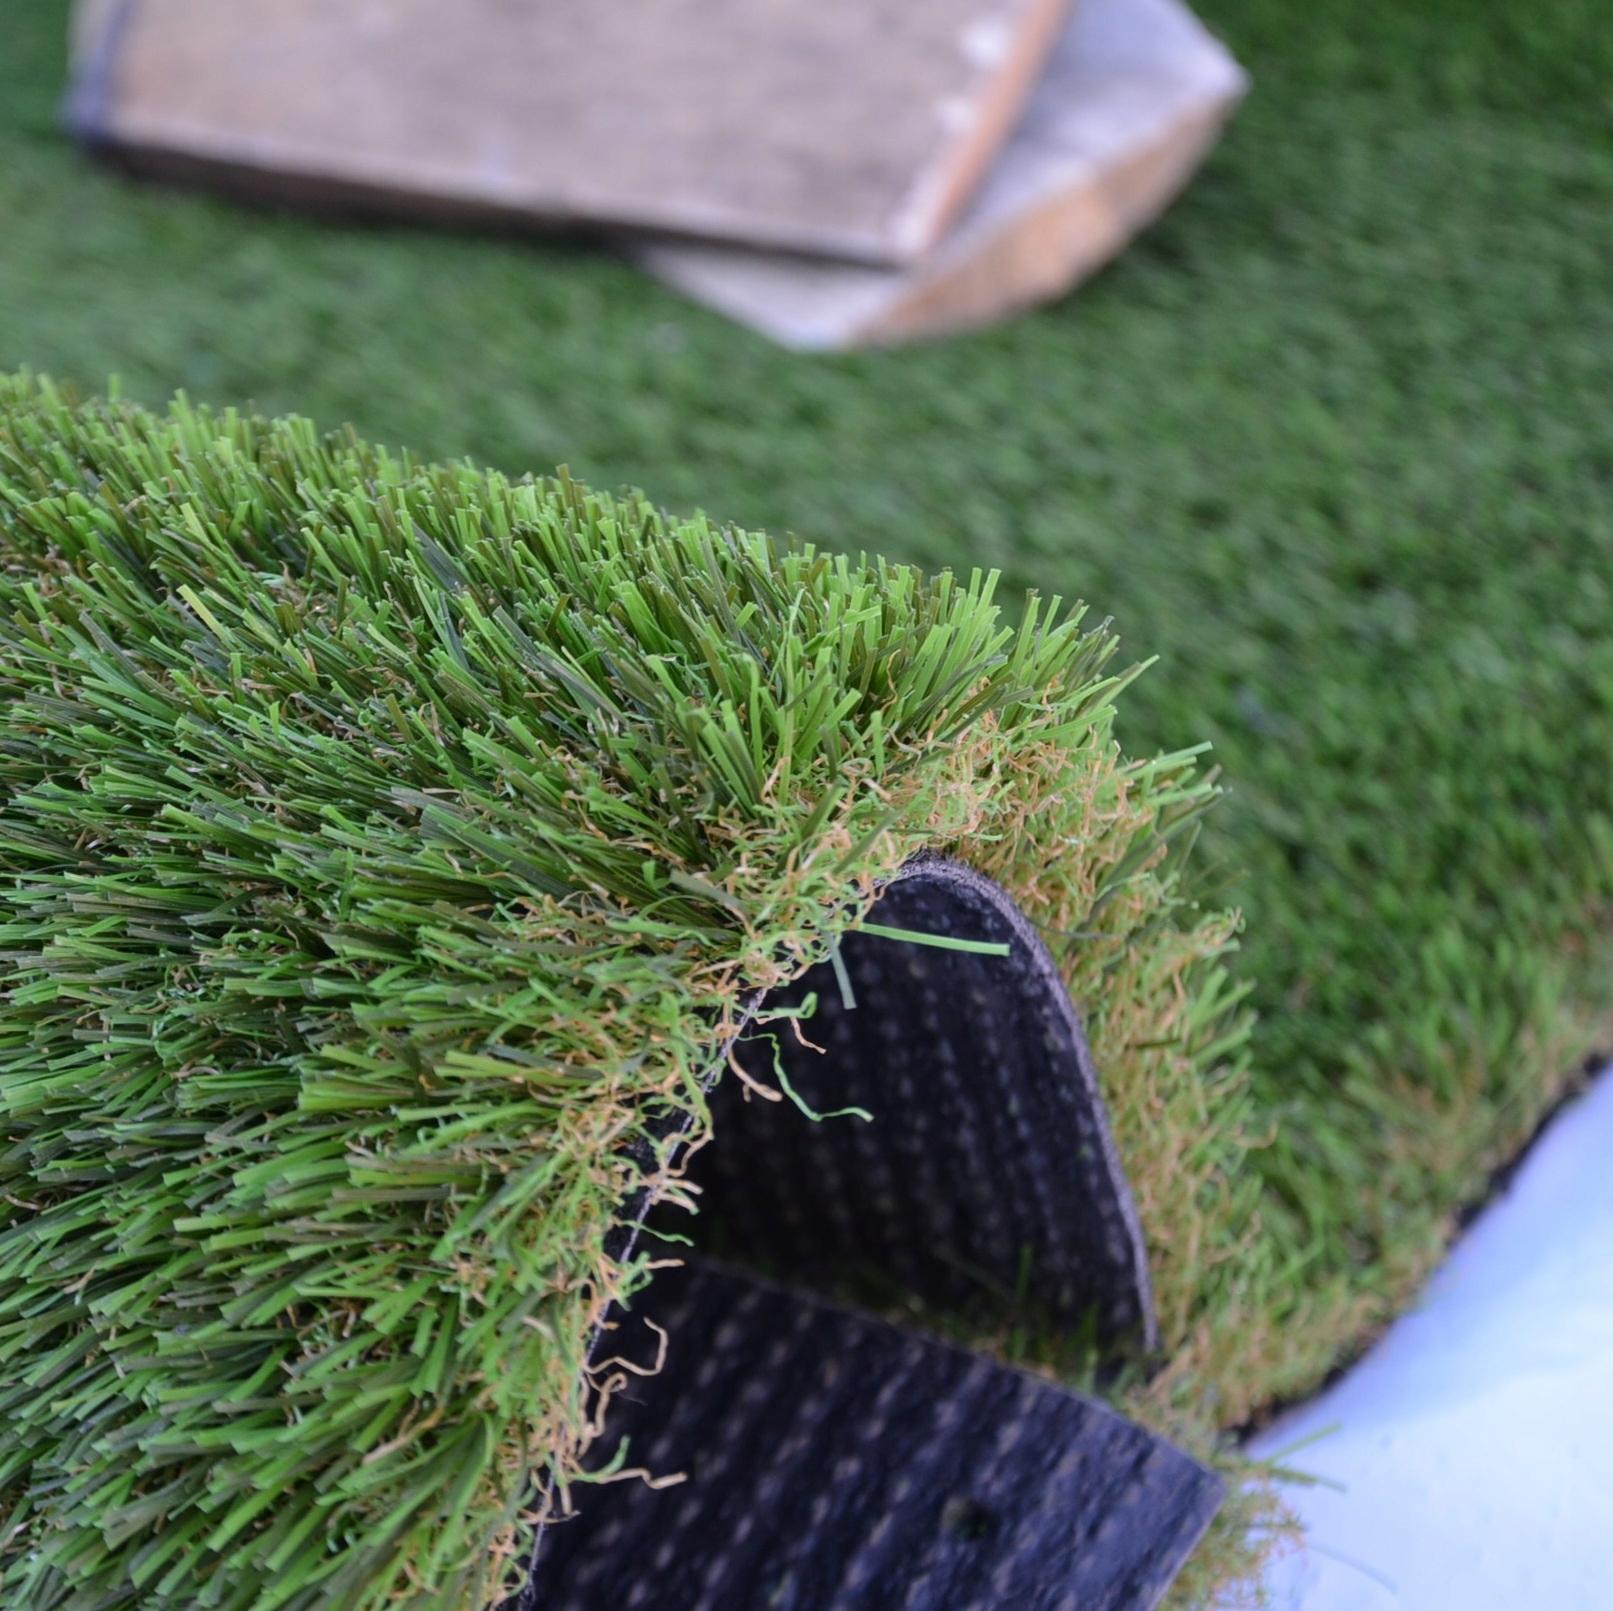 Koberec Umelá tráva CABANA| hrubé| 40 mm|záhrada|400x550